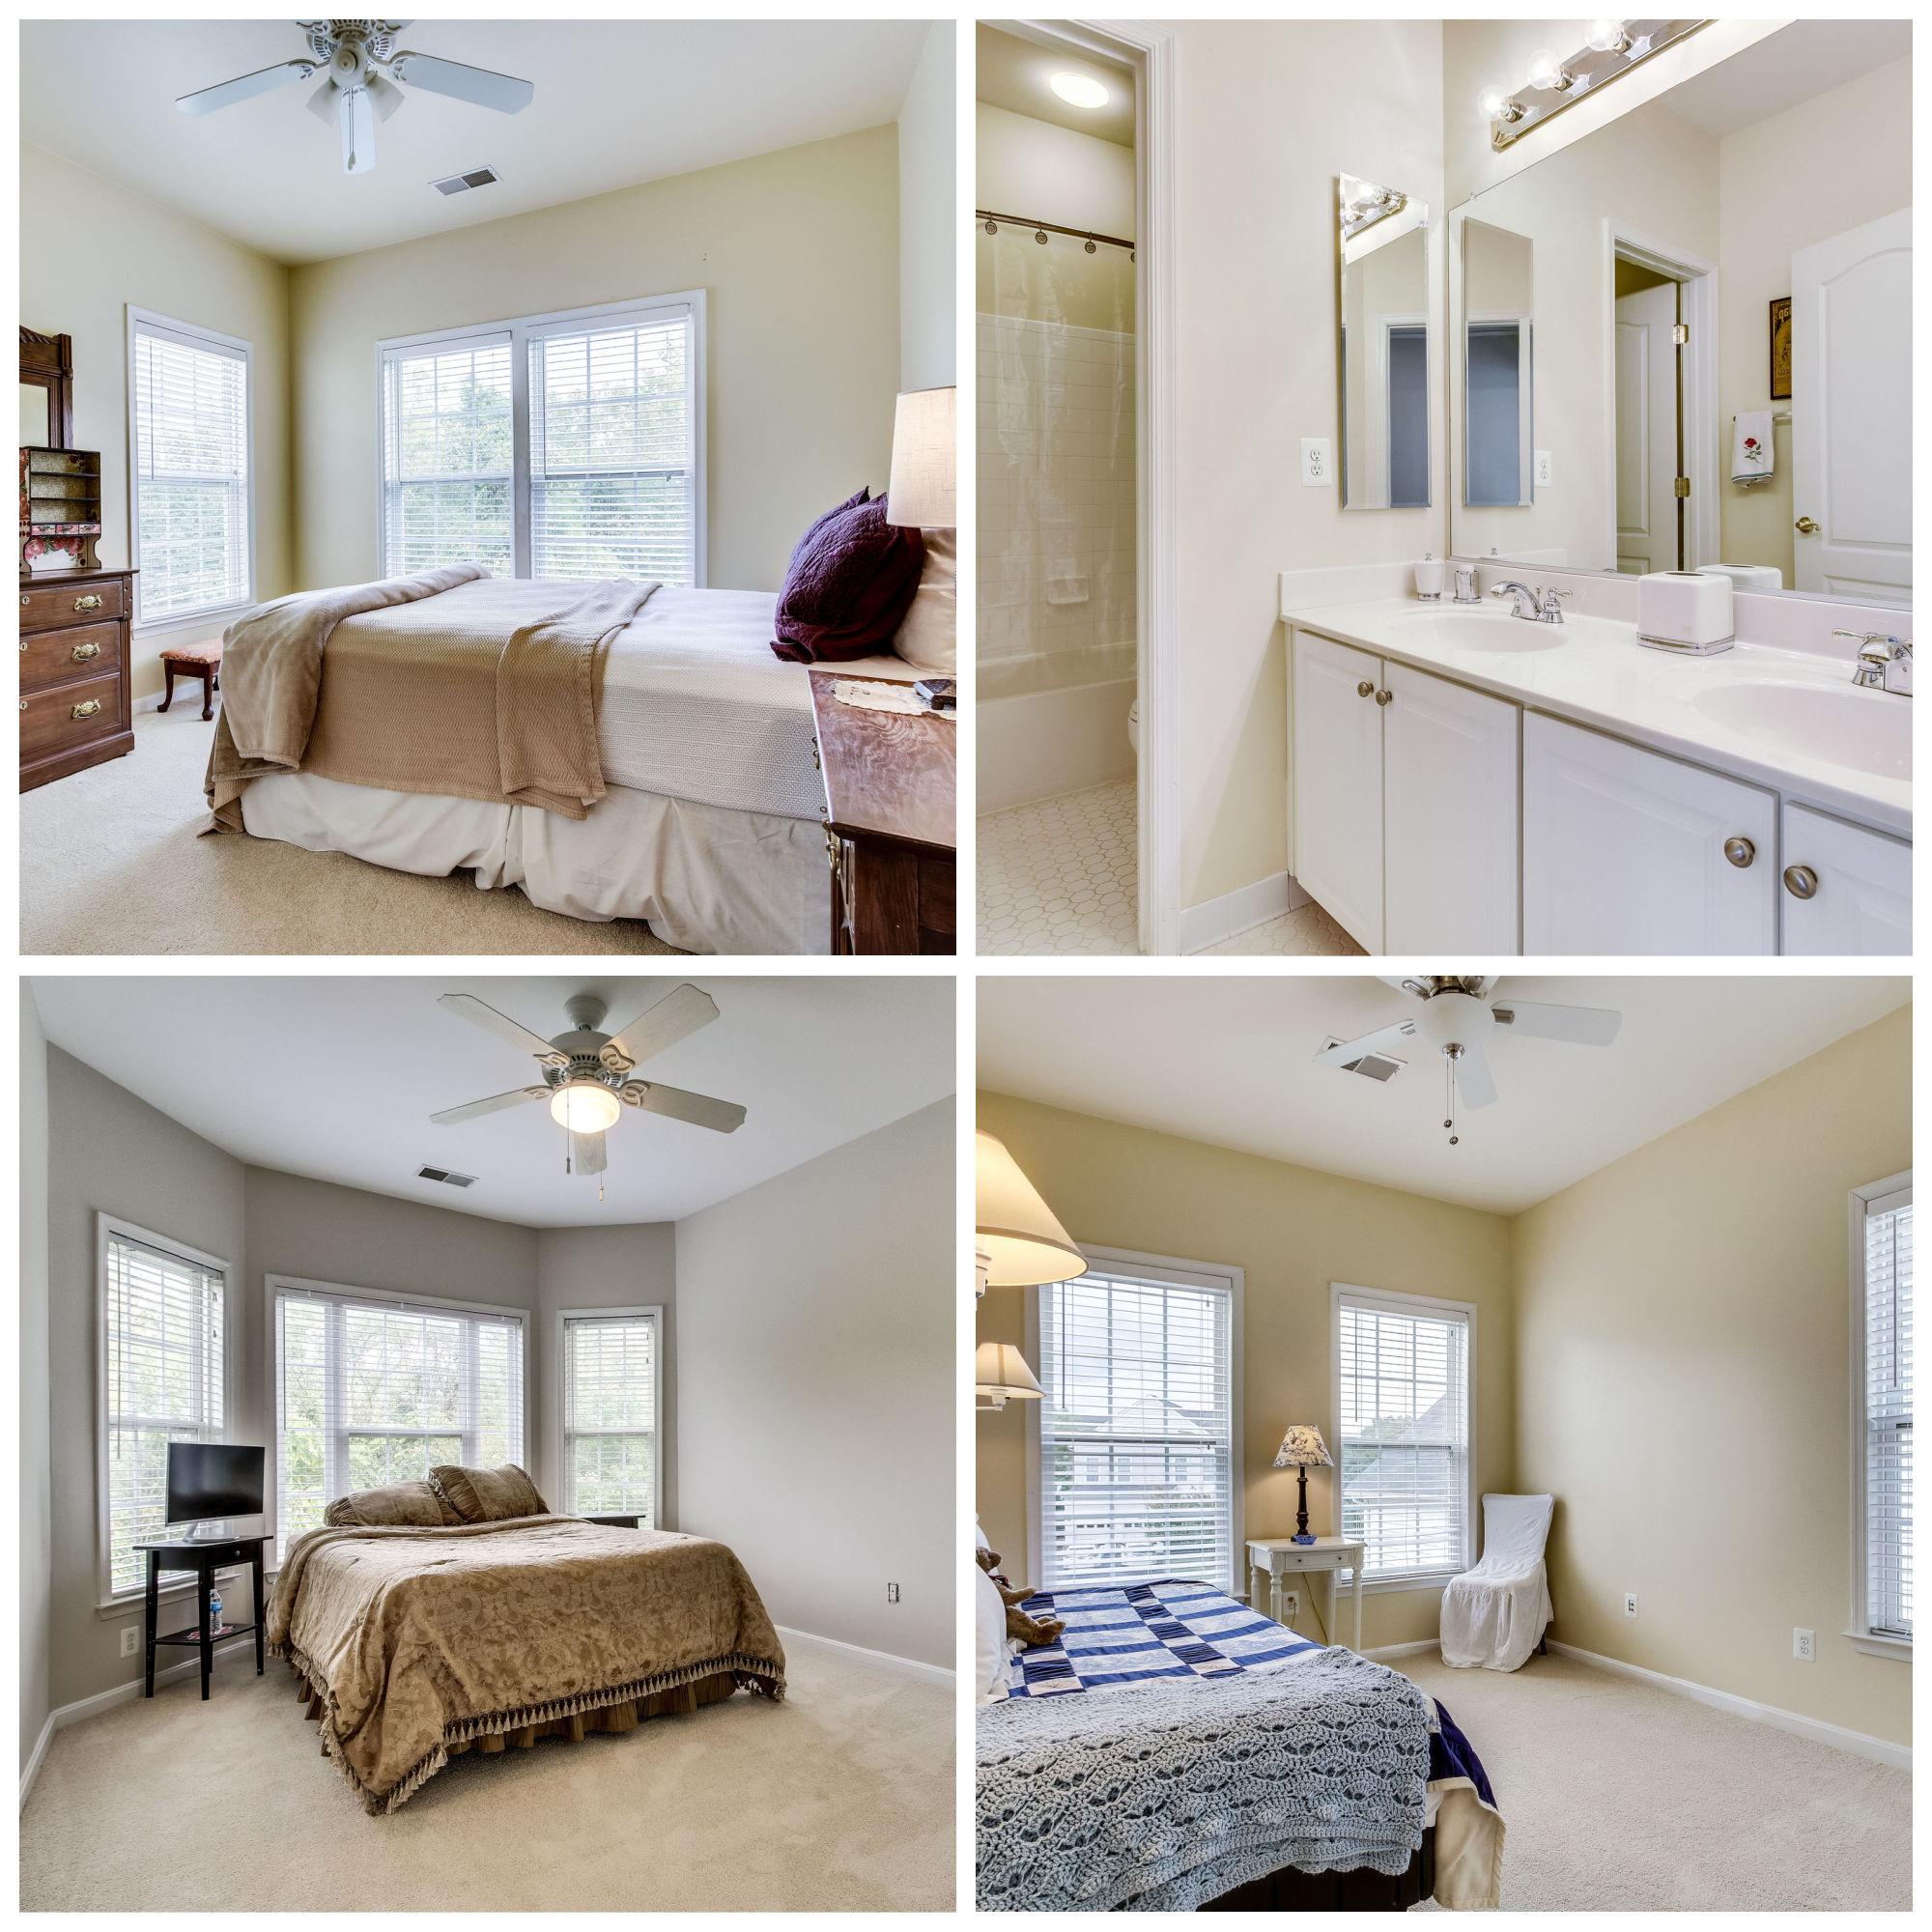 21930 Windover Dr, Broadlands- Additional Bedrooms and Baths